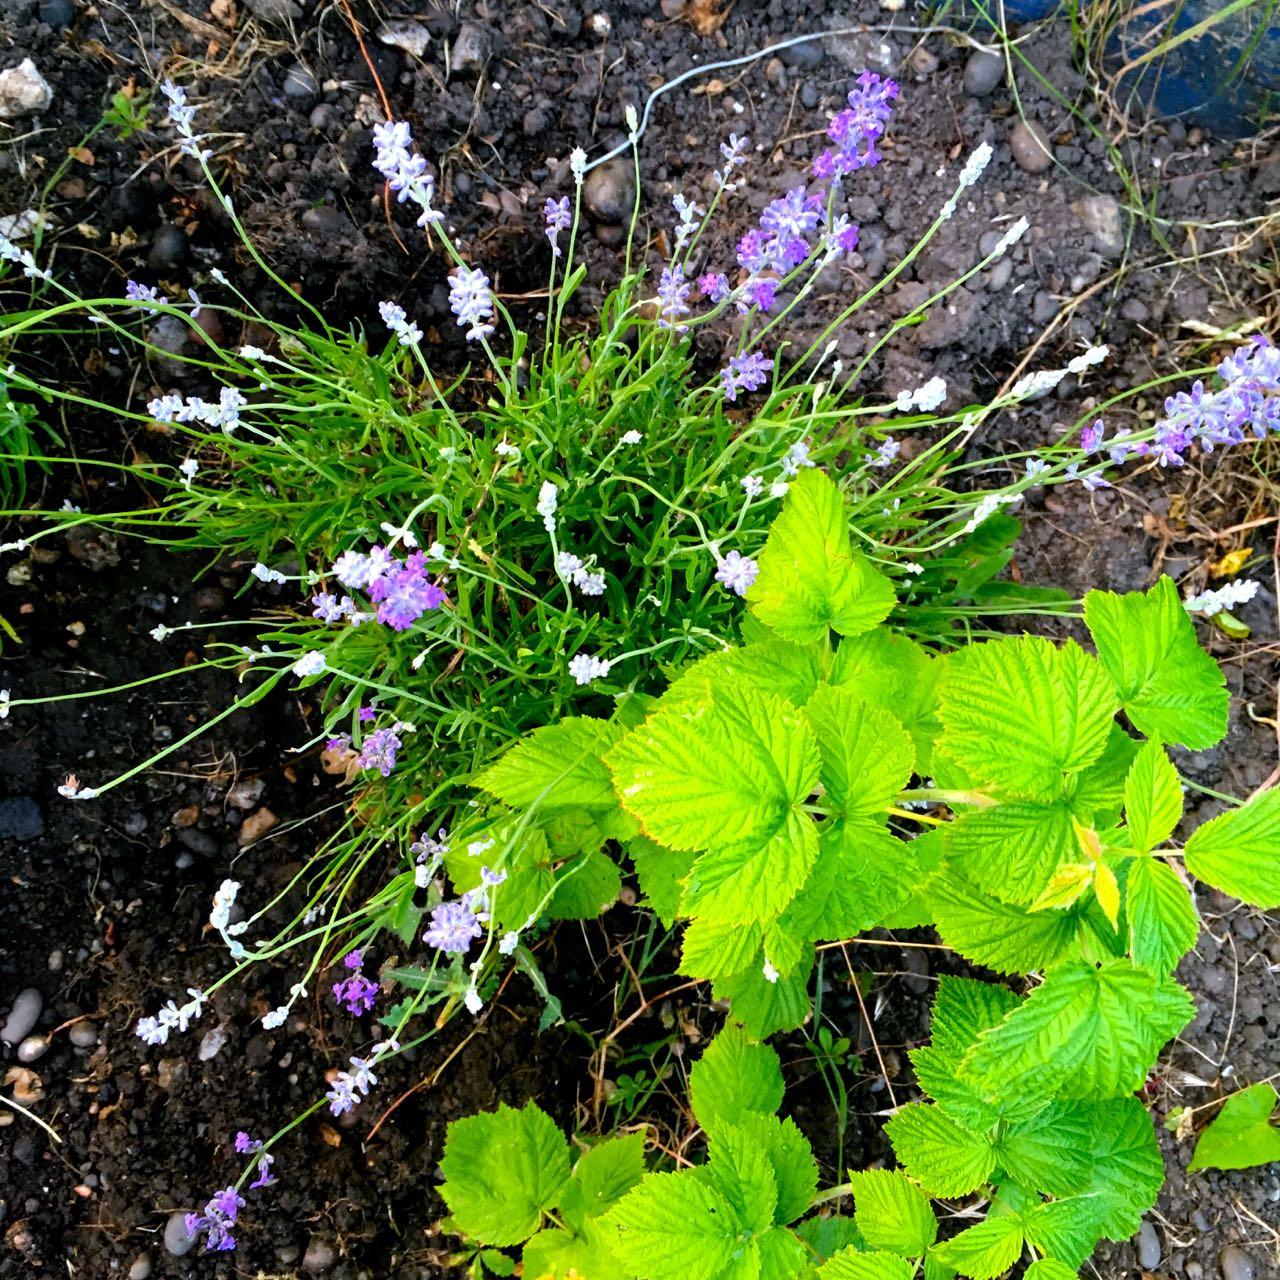 lavender and raspberries